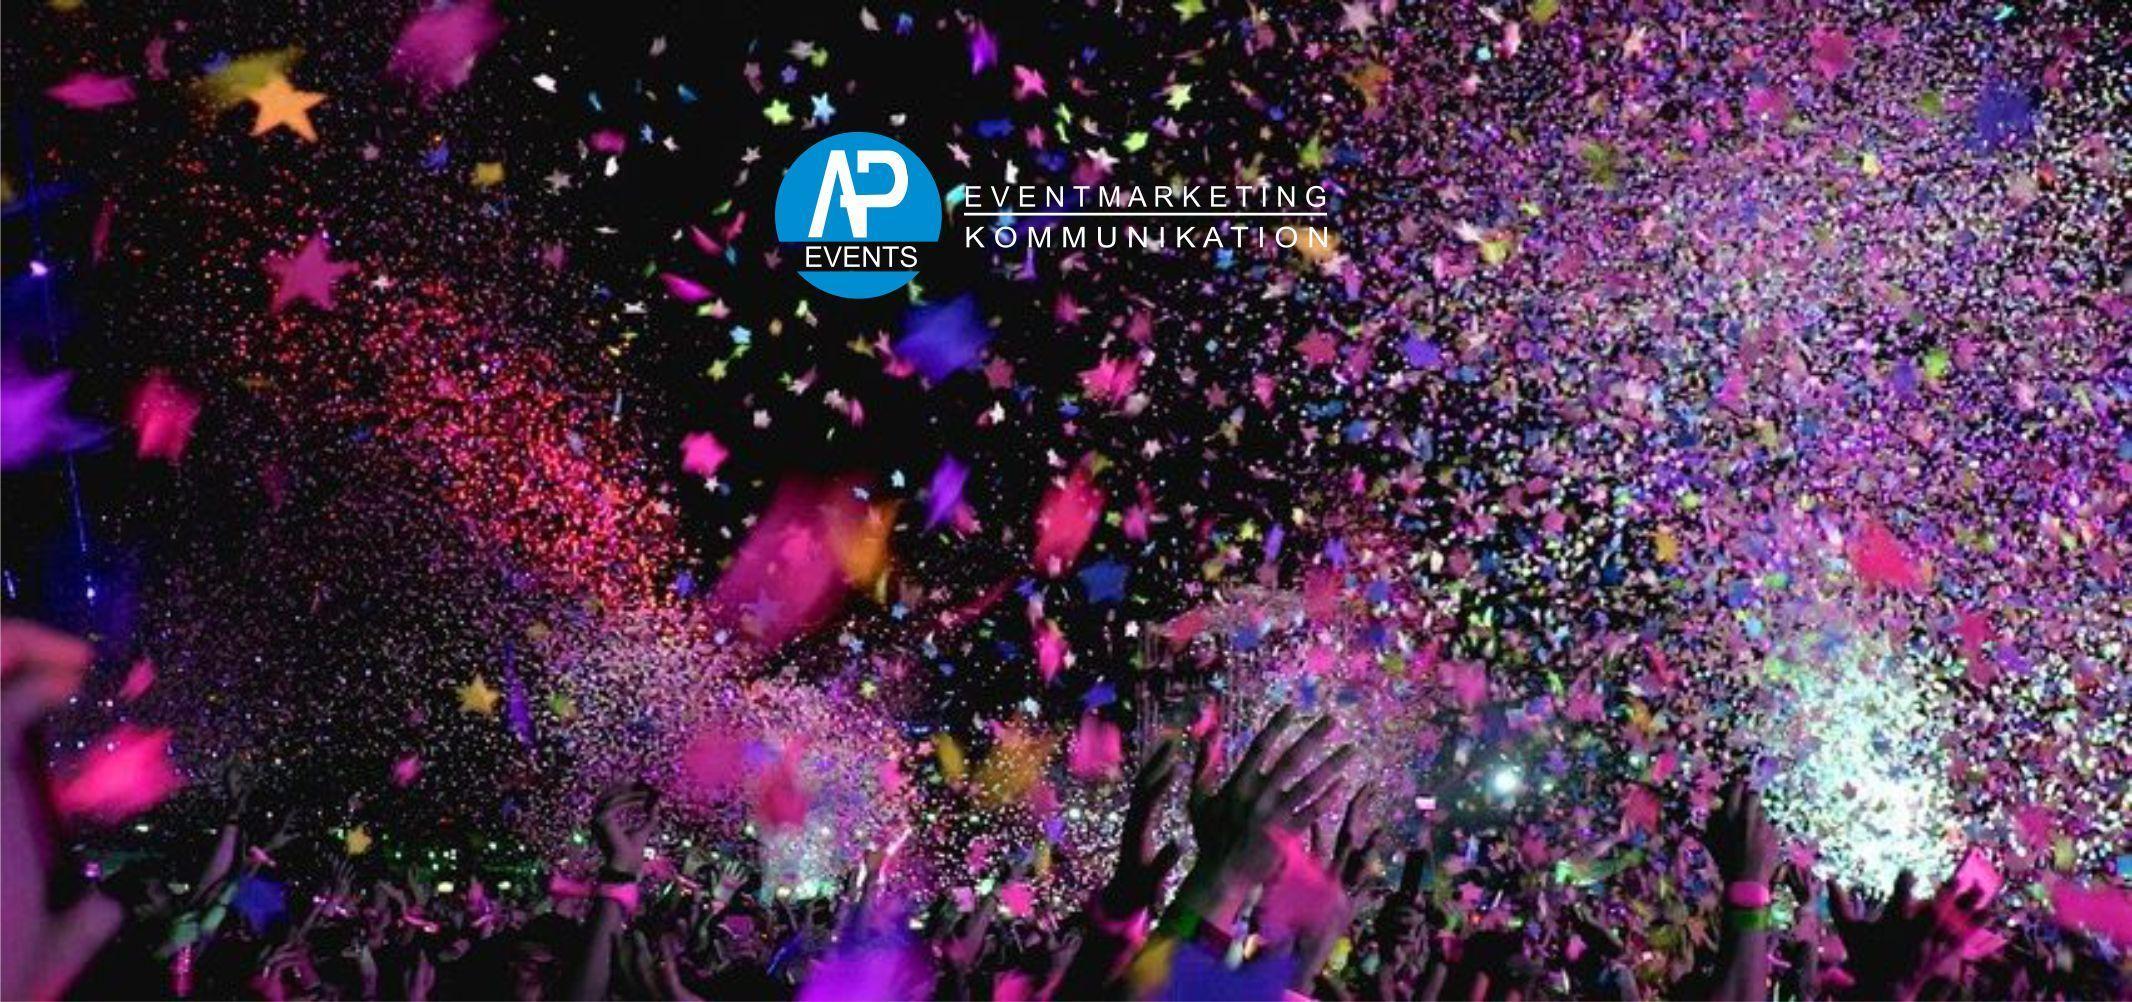 Eventmarketing - Eventmanagement | AP Events